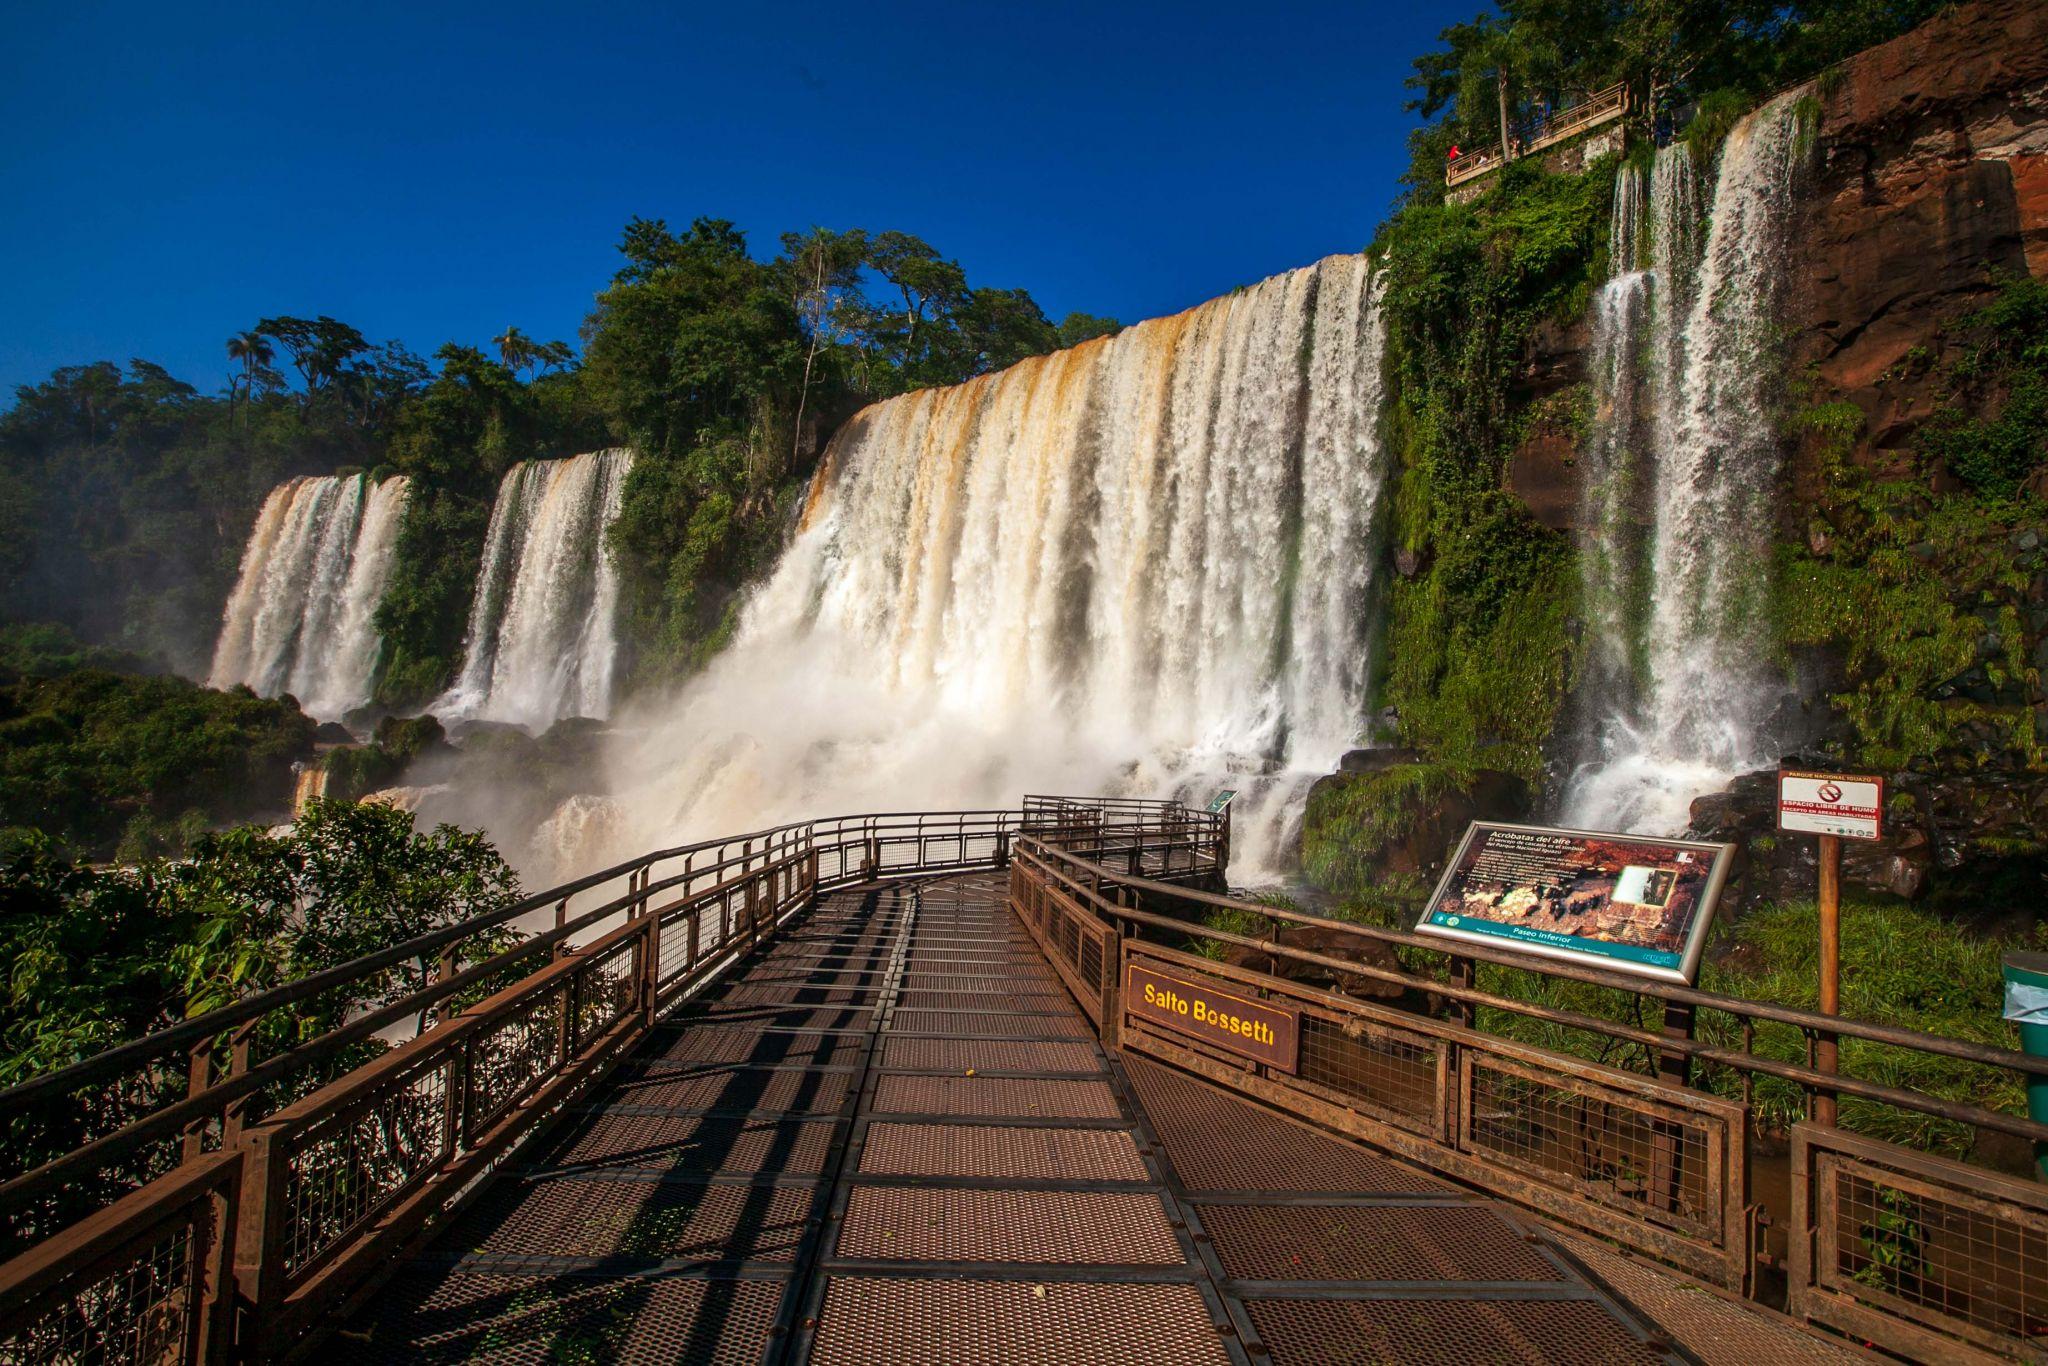 Salto Bossetti Iguazu Falls, Argentina